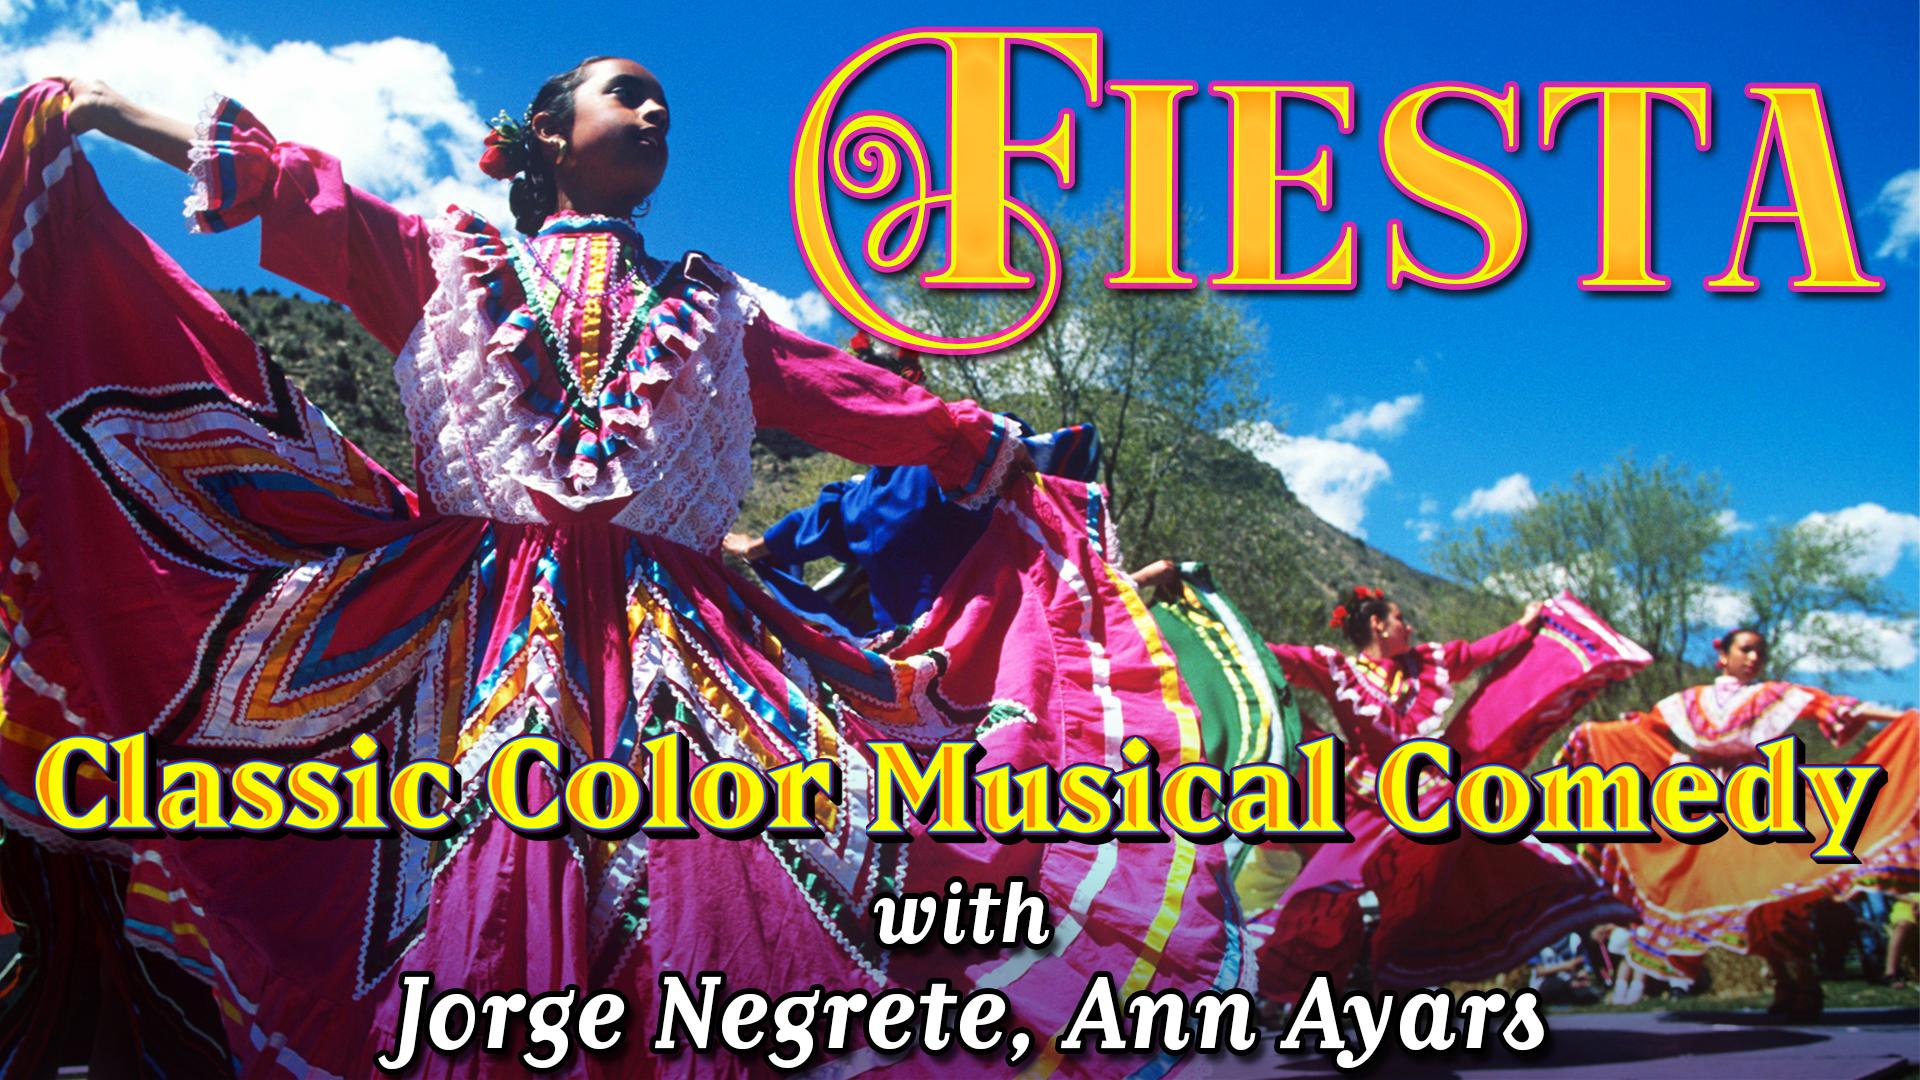 Fiesta - 1941 Color Musical Comedy w/ Jorge Negrete, Anne Ayars